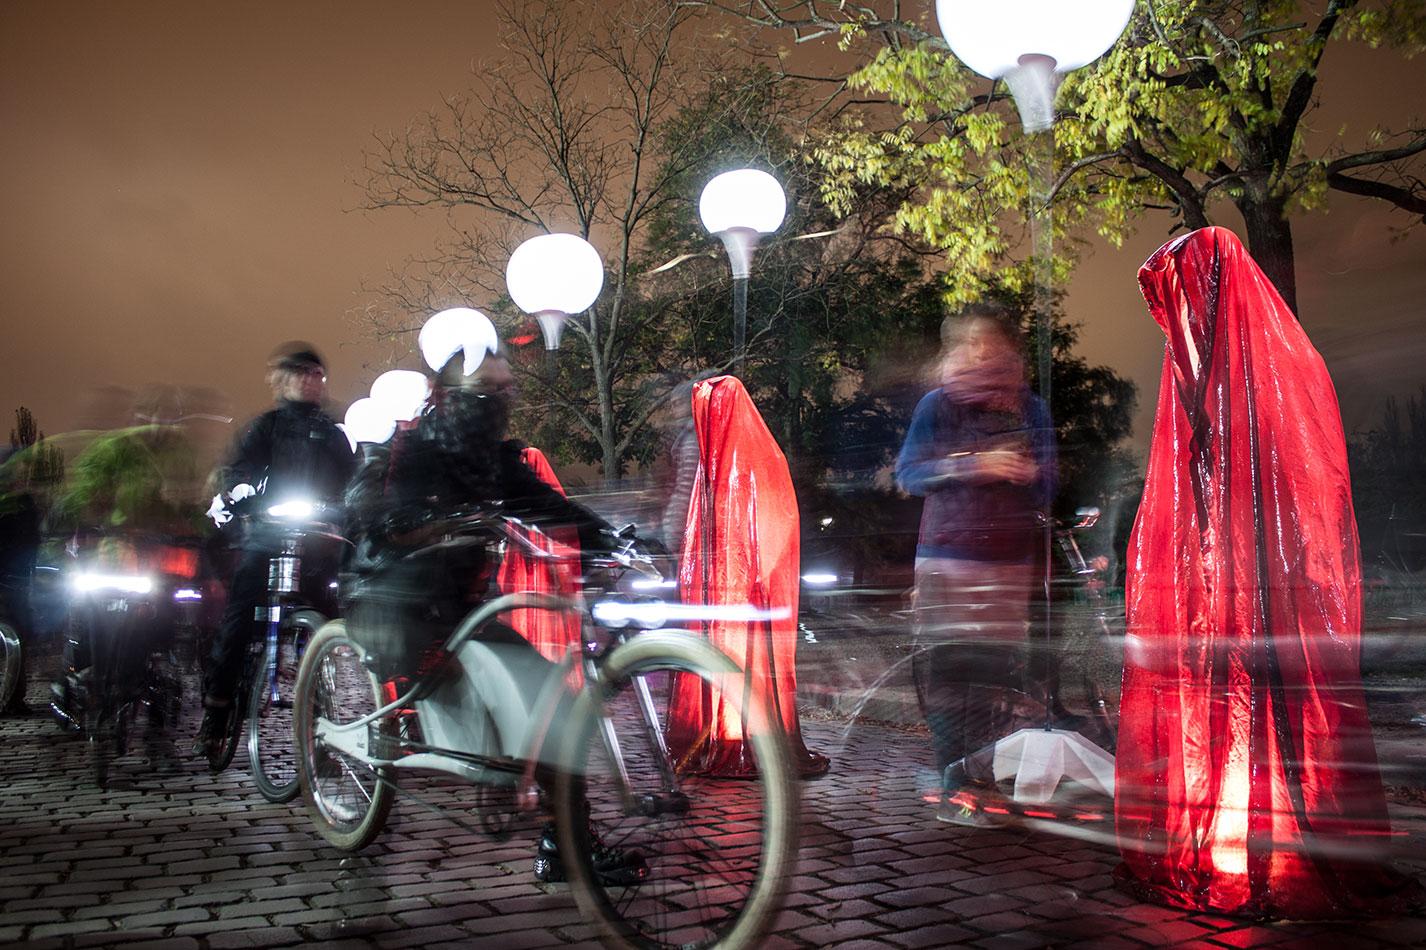 25-years-wallfall-berlin-germany-wallpark-contemporary-fine-art-show-arts-design-guardians-of-time-manfred-kili-kielnhofer-4364